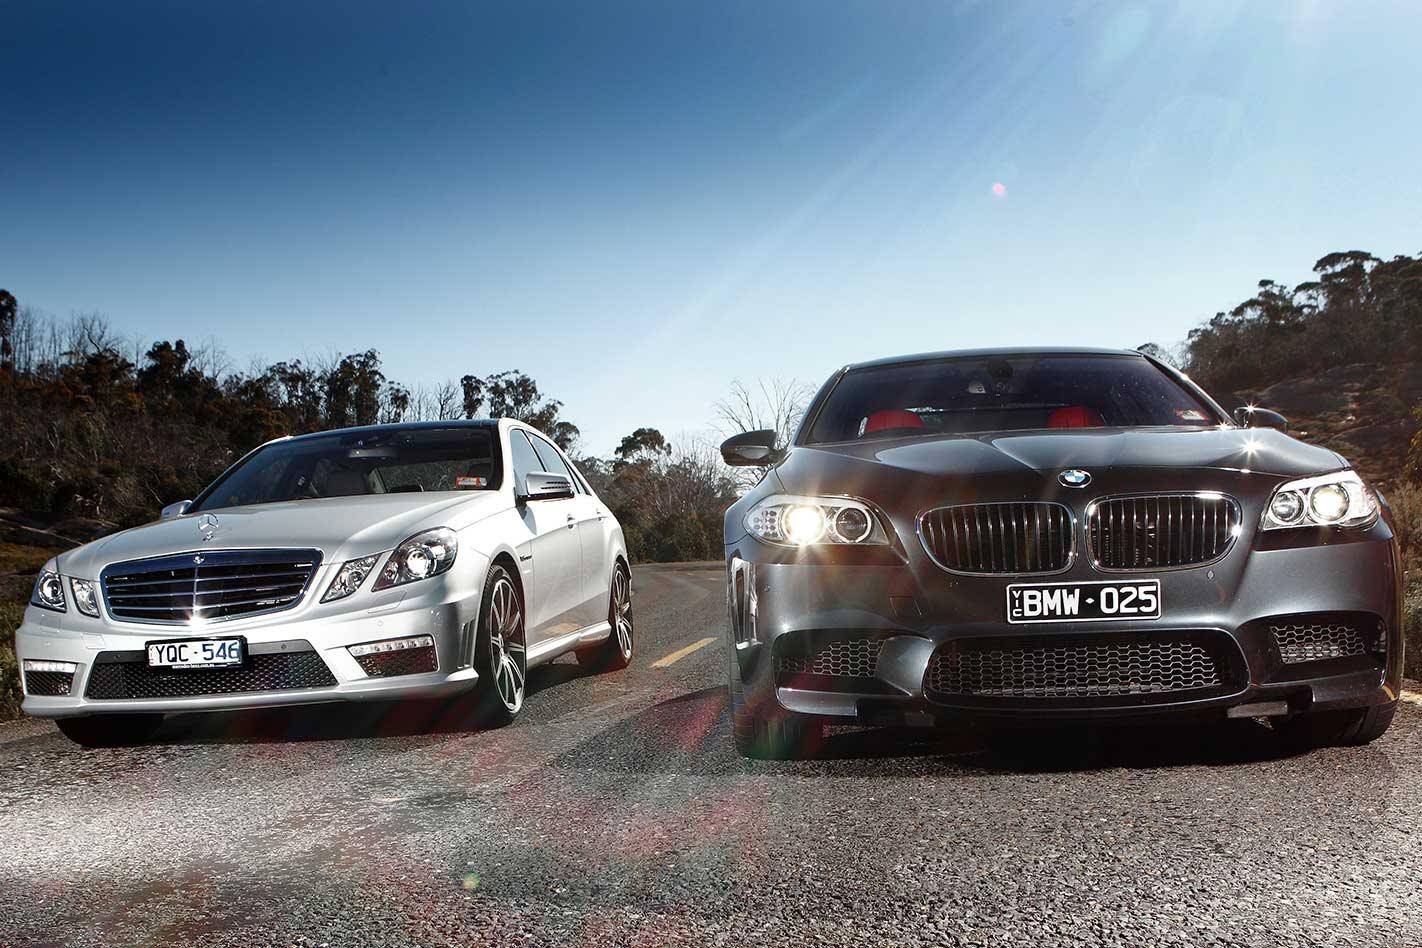 2010 Super Sedan Stoush Bmw M5 Vs Mercedes Benz E63 Amg Comparison